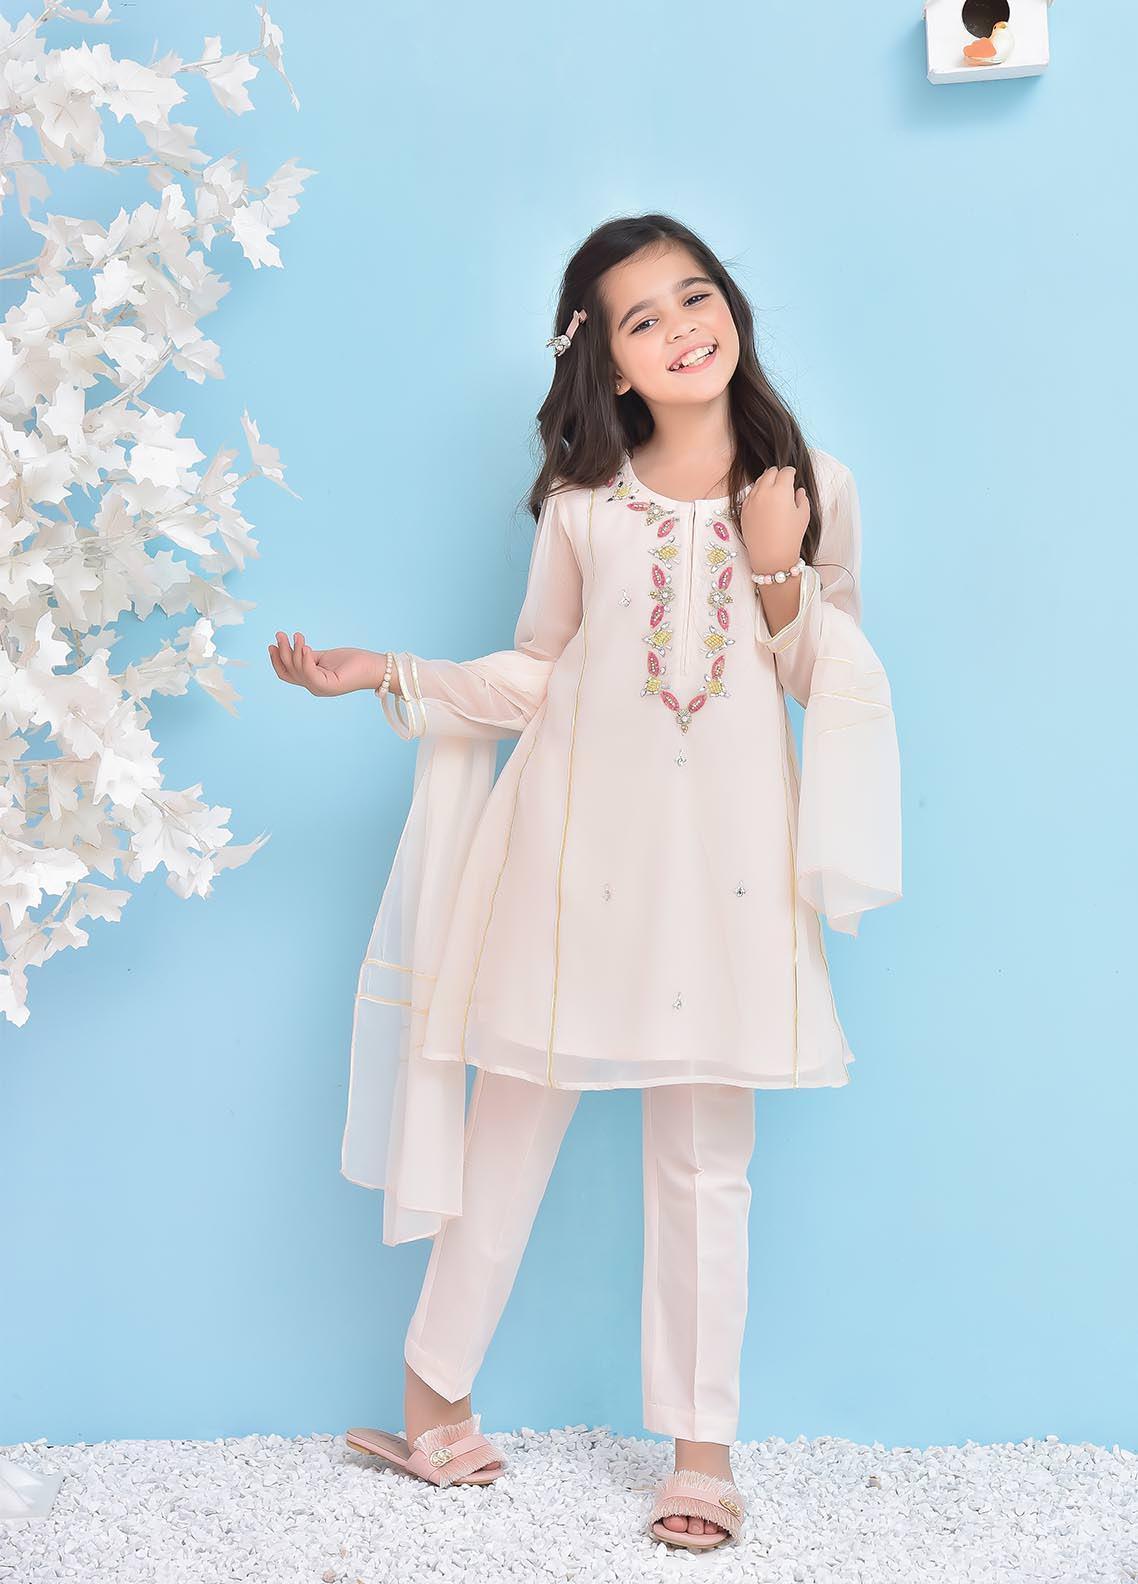 Ochre Chiffon  3 Piece Suit for Girls -  OFW53 Poweder Pink